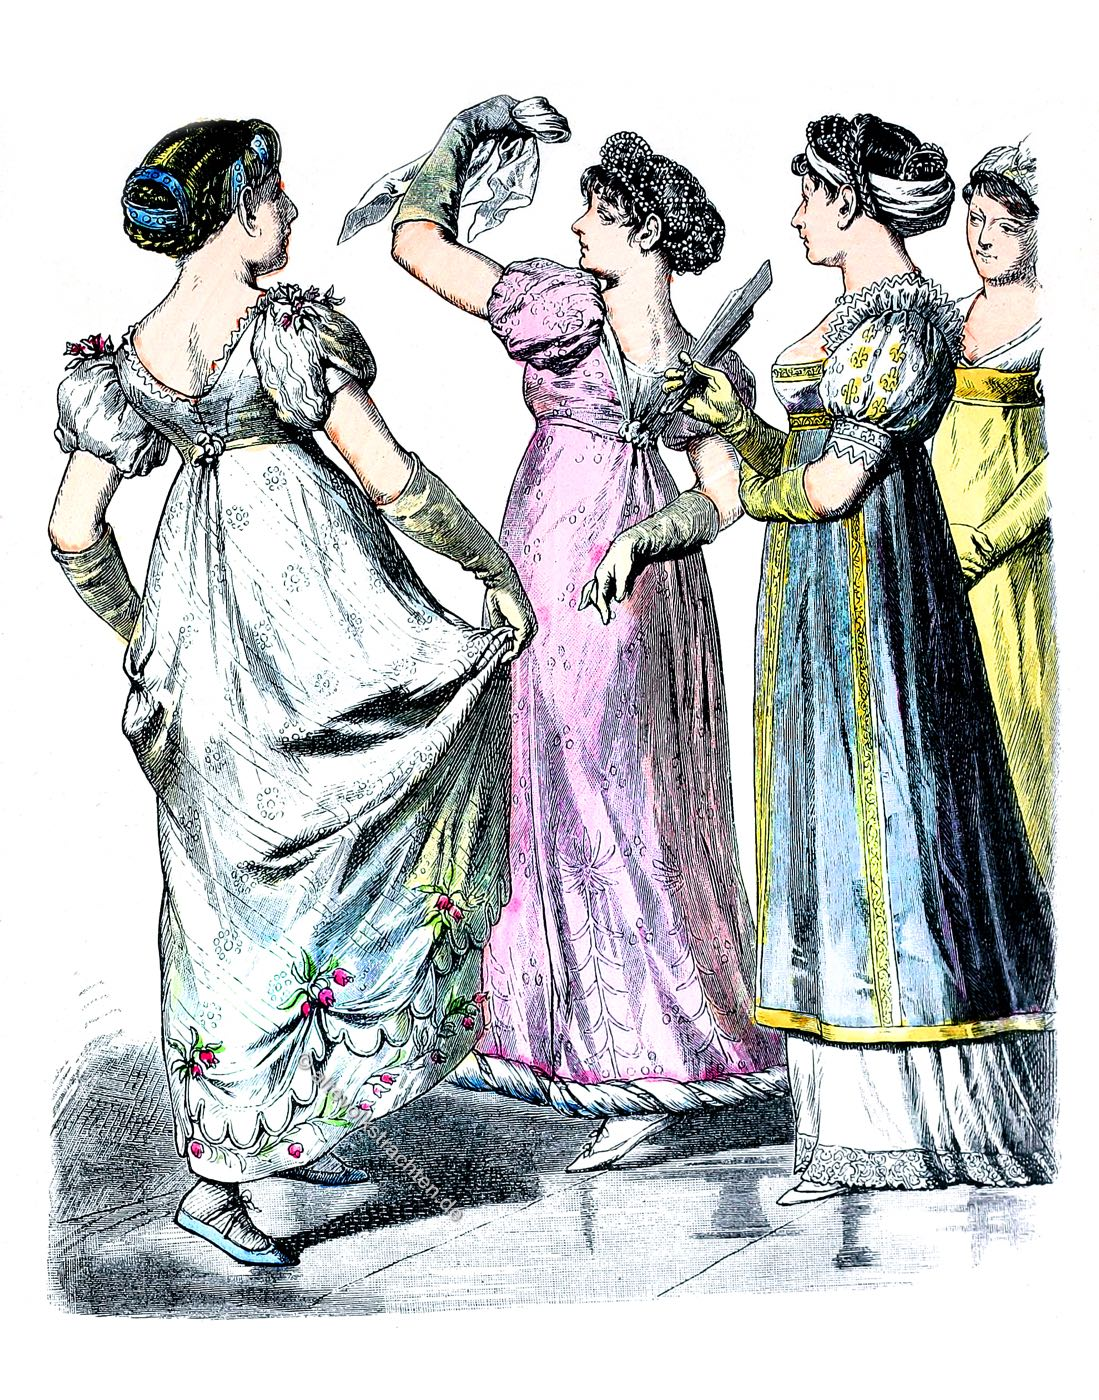 Empire, Regency, Trachten, Mode, Kostüme, Costume, Münchener Bilderbogen